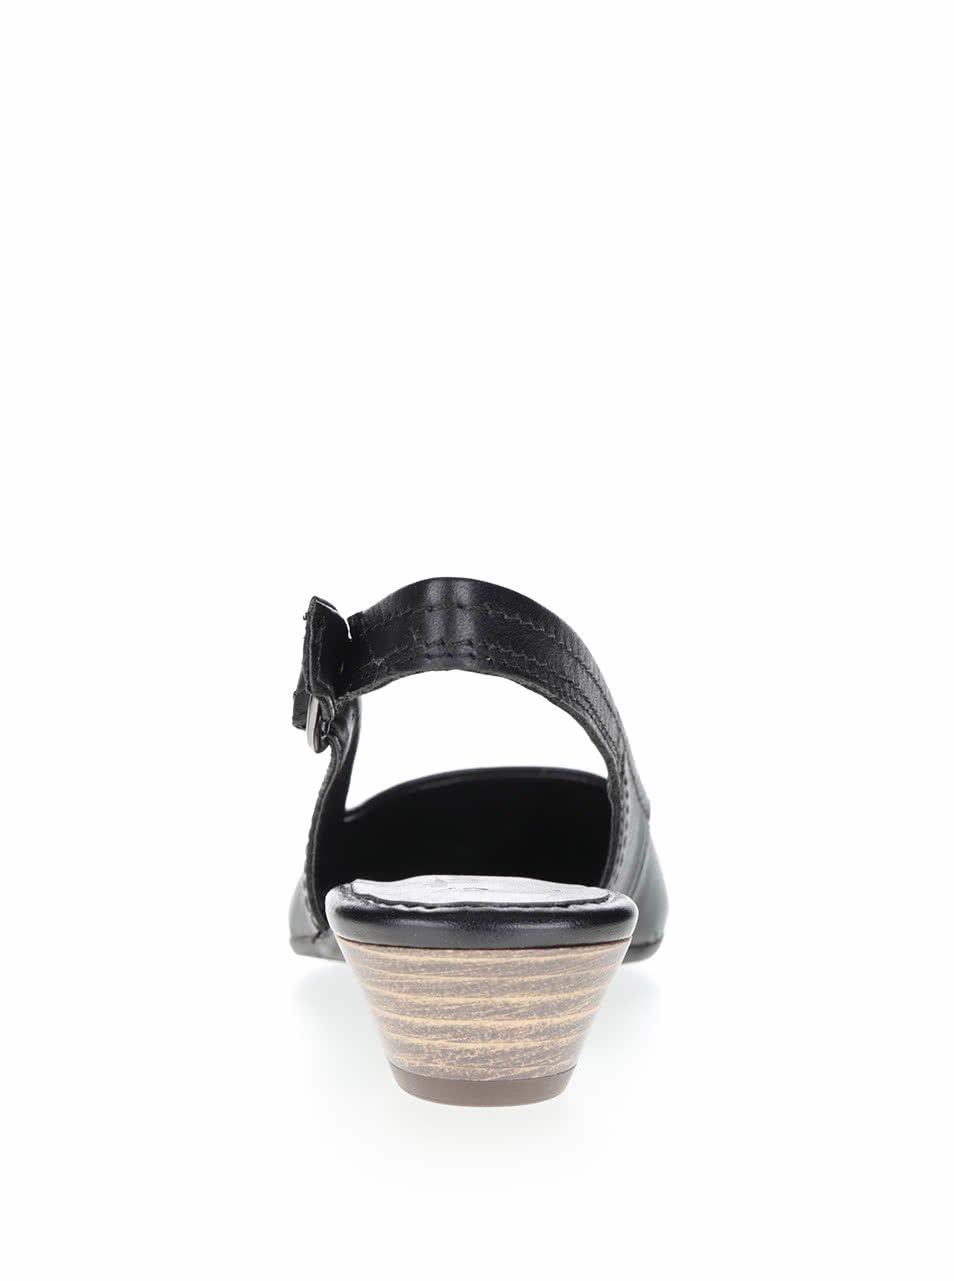 Černé kožené lodičky na nízkém podpatku Tamaris - eleganter.cz deb8555881